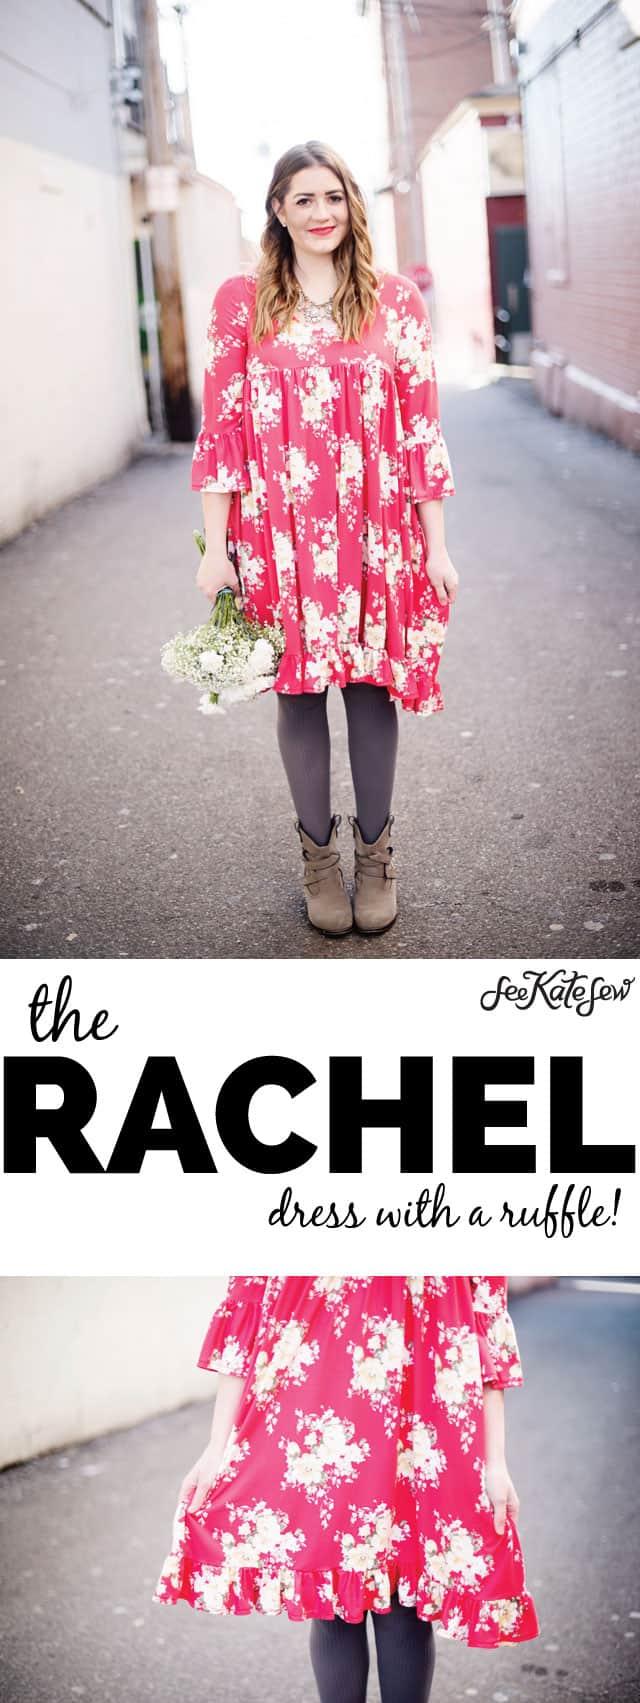 The Rachel Dress Pattern with a Ruffle | diy dress patterns | sewing patterns | ruffle dress pattern | diy ruffle dress || See Kate Sew #ruffledress #diydress #dresspattern